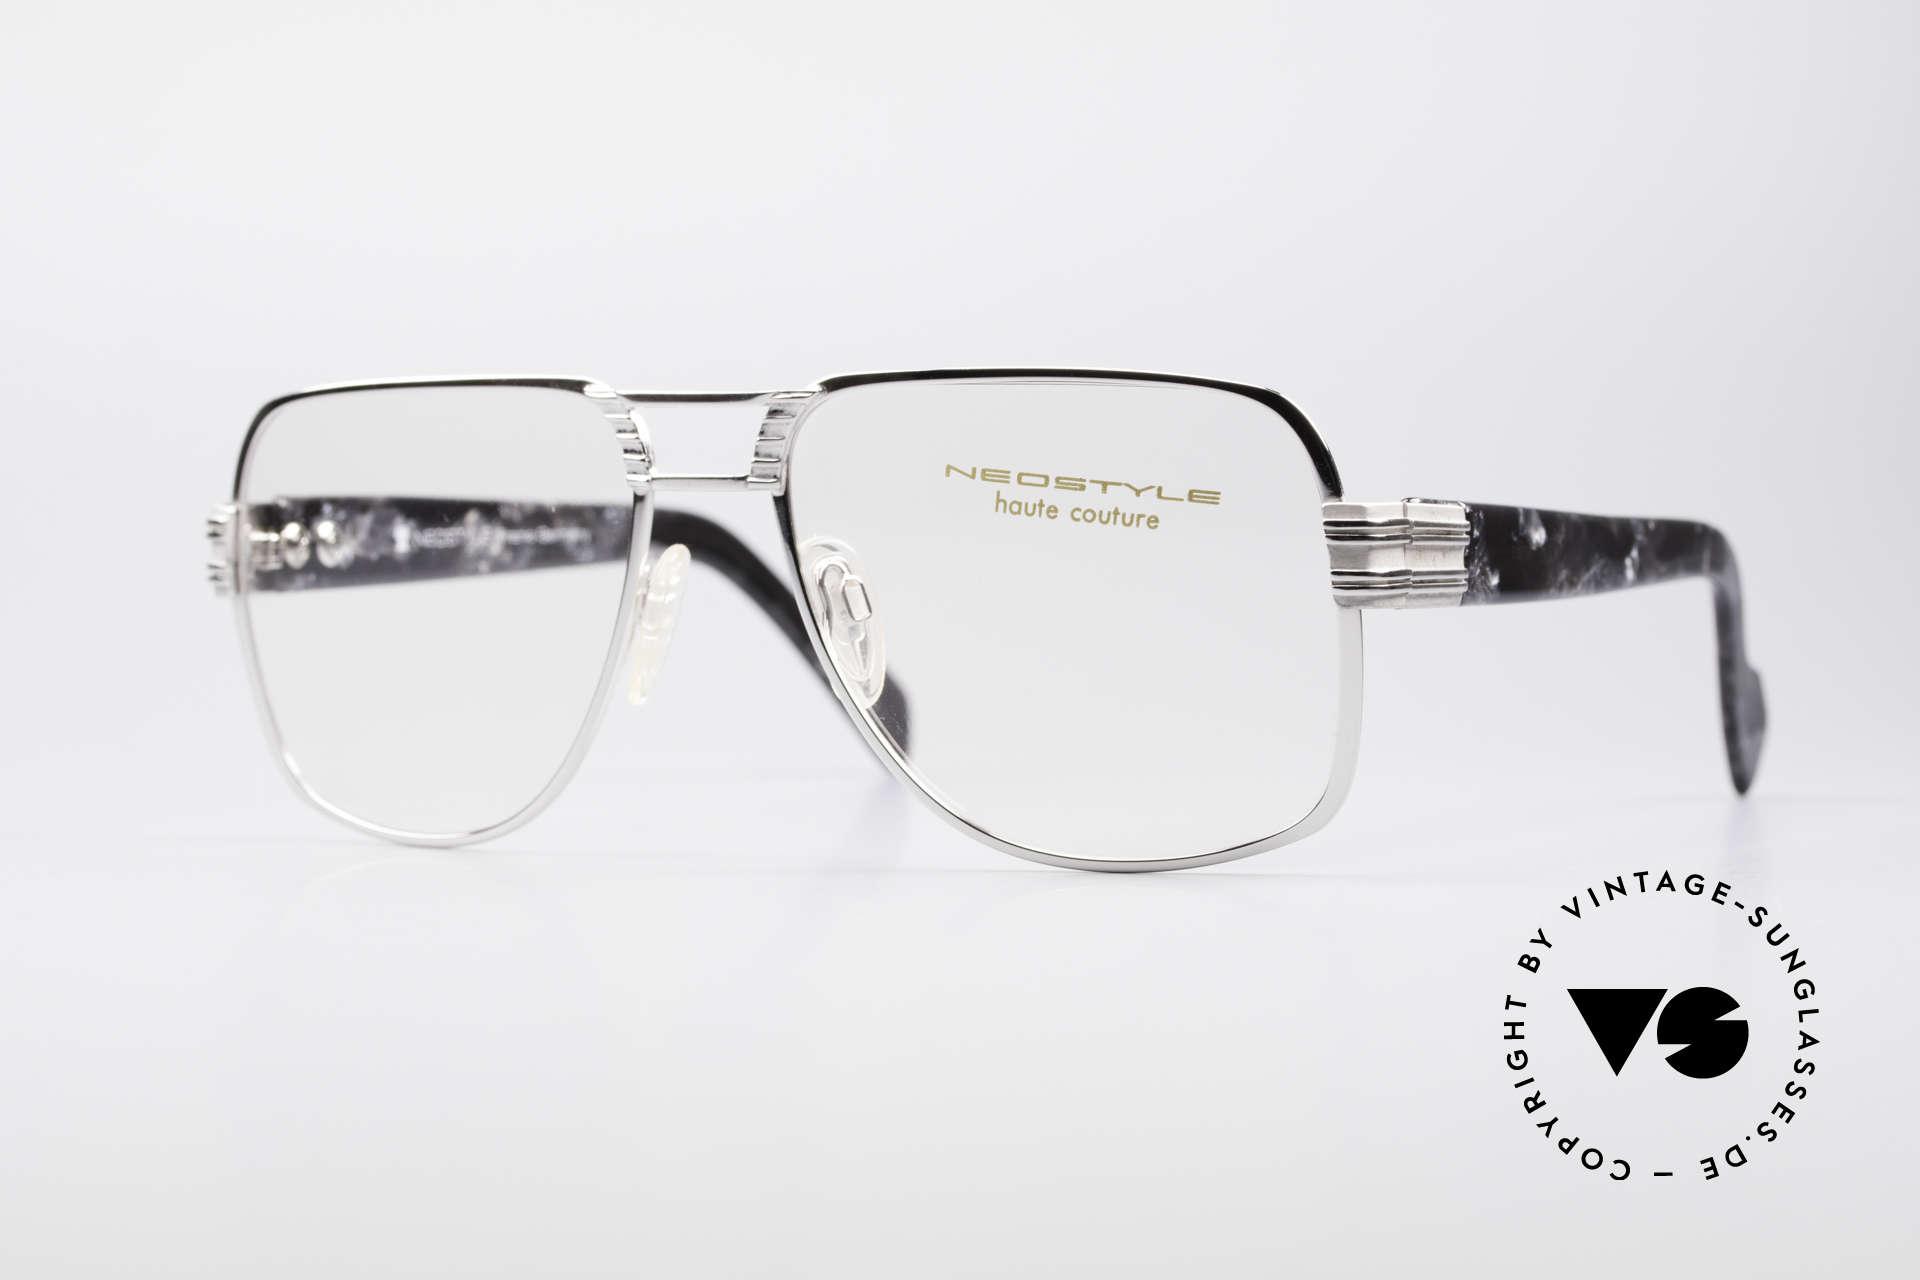 0b2360fc34 Glasses Neostyle Boutique 670 80 s Men s Eyeglasses X-Large ...